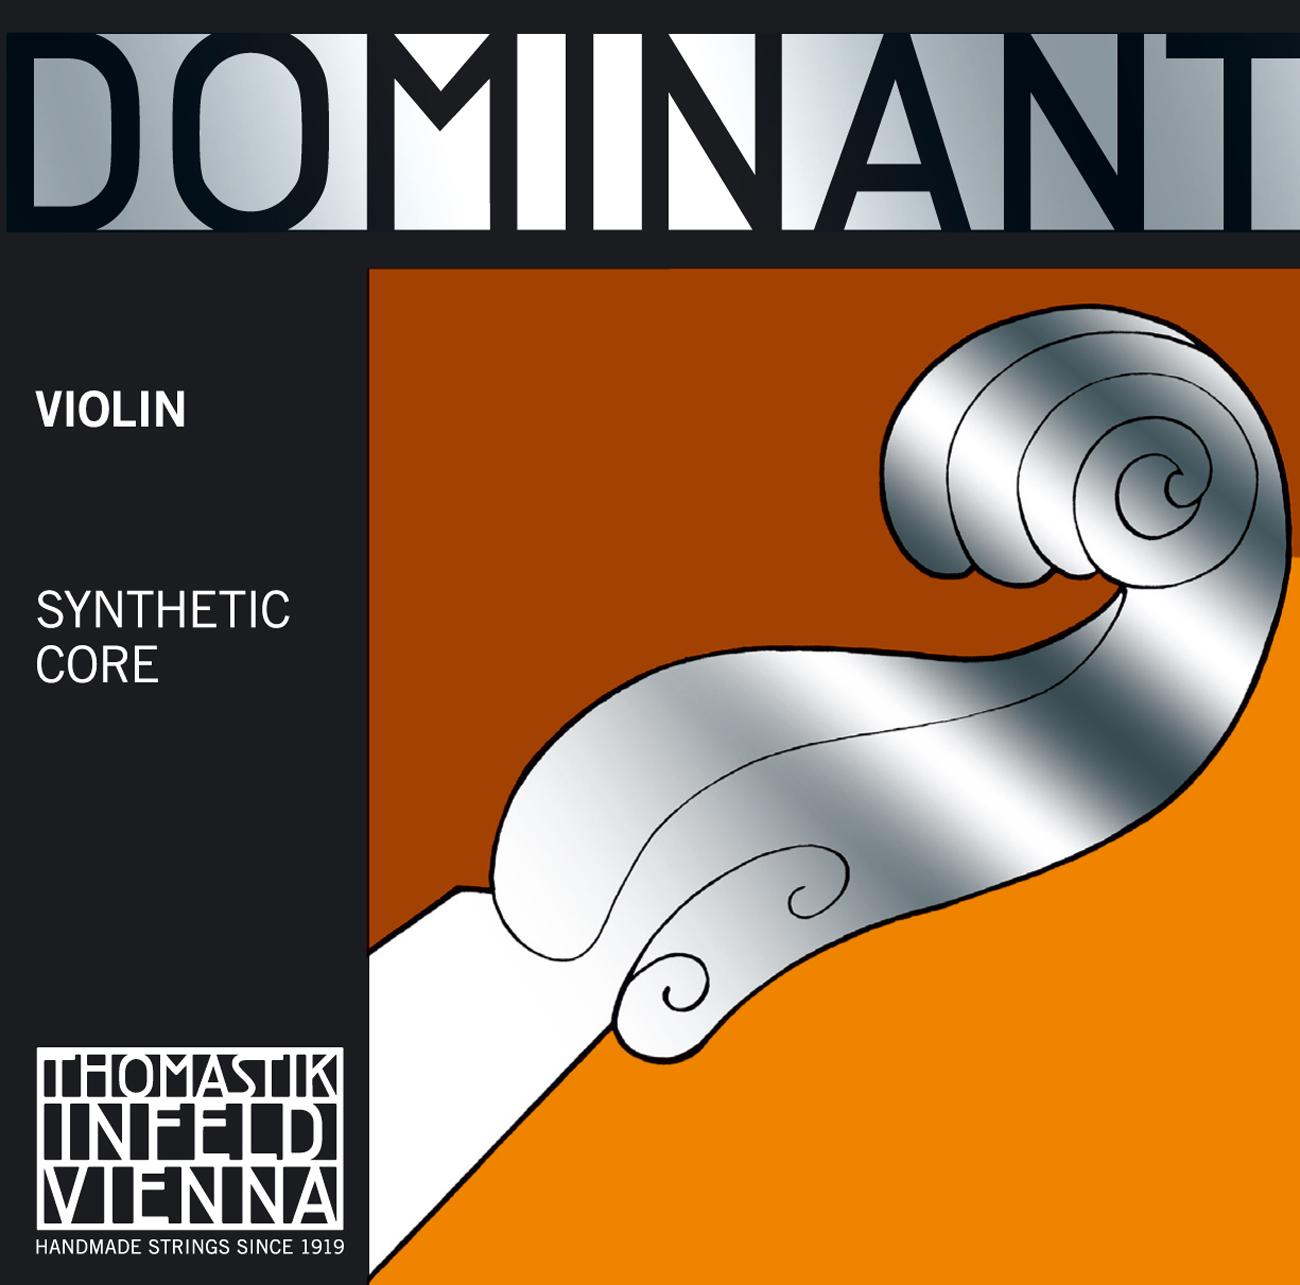 Dominant Violin E Carbon Steel ball 4/4